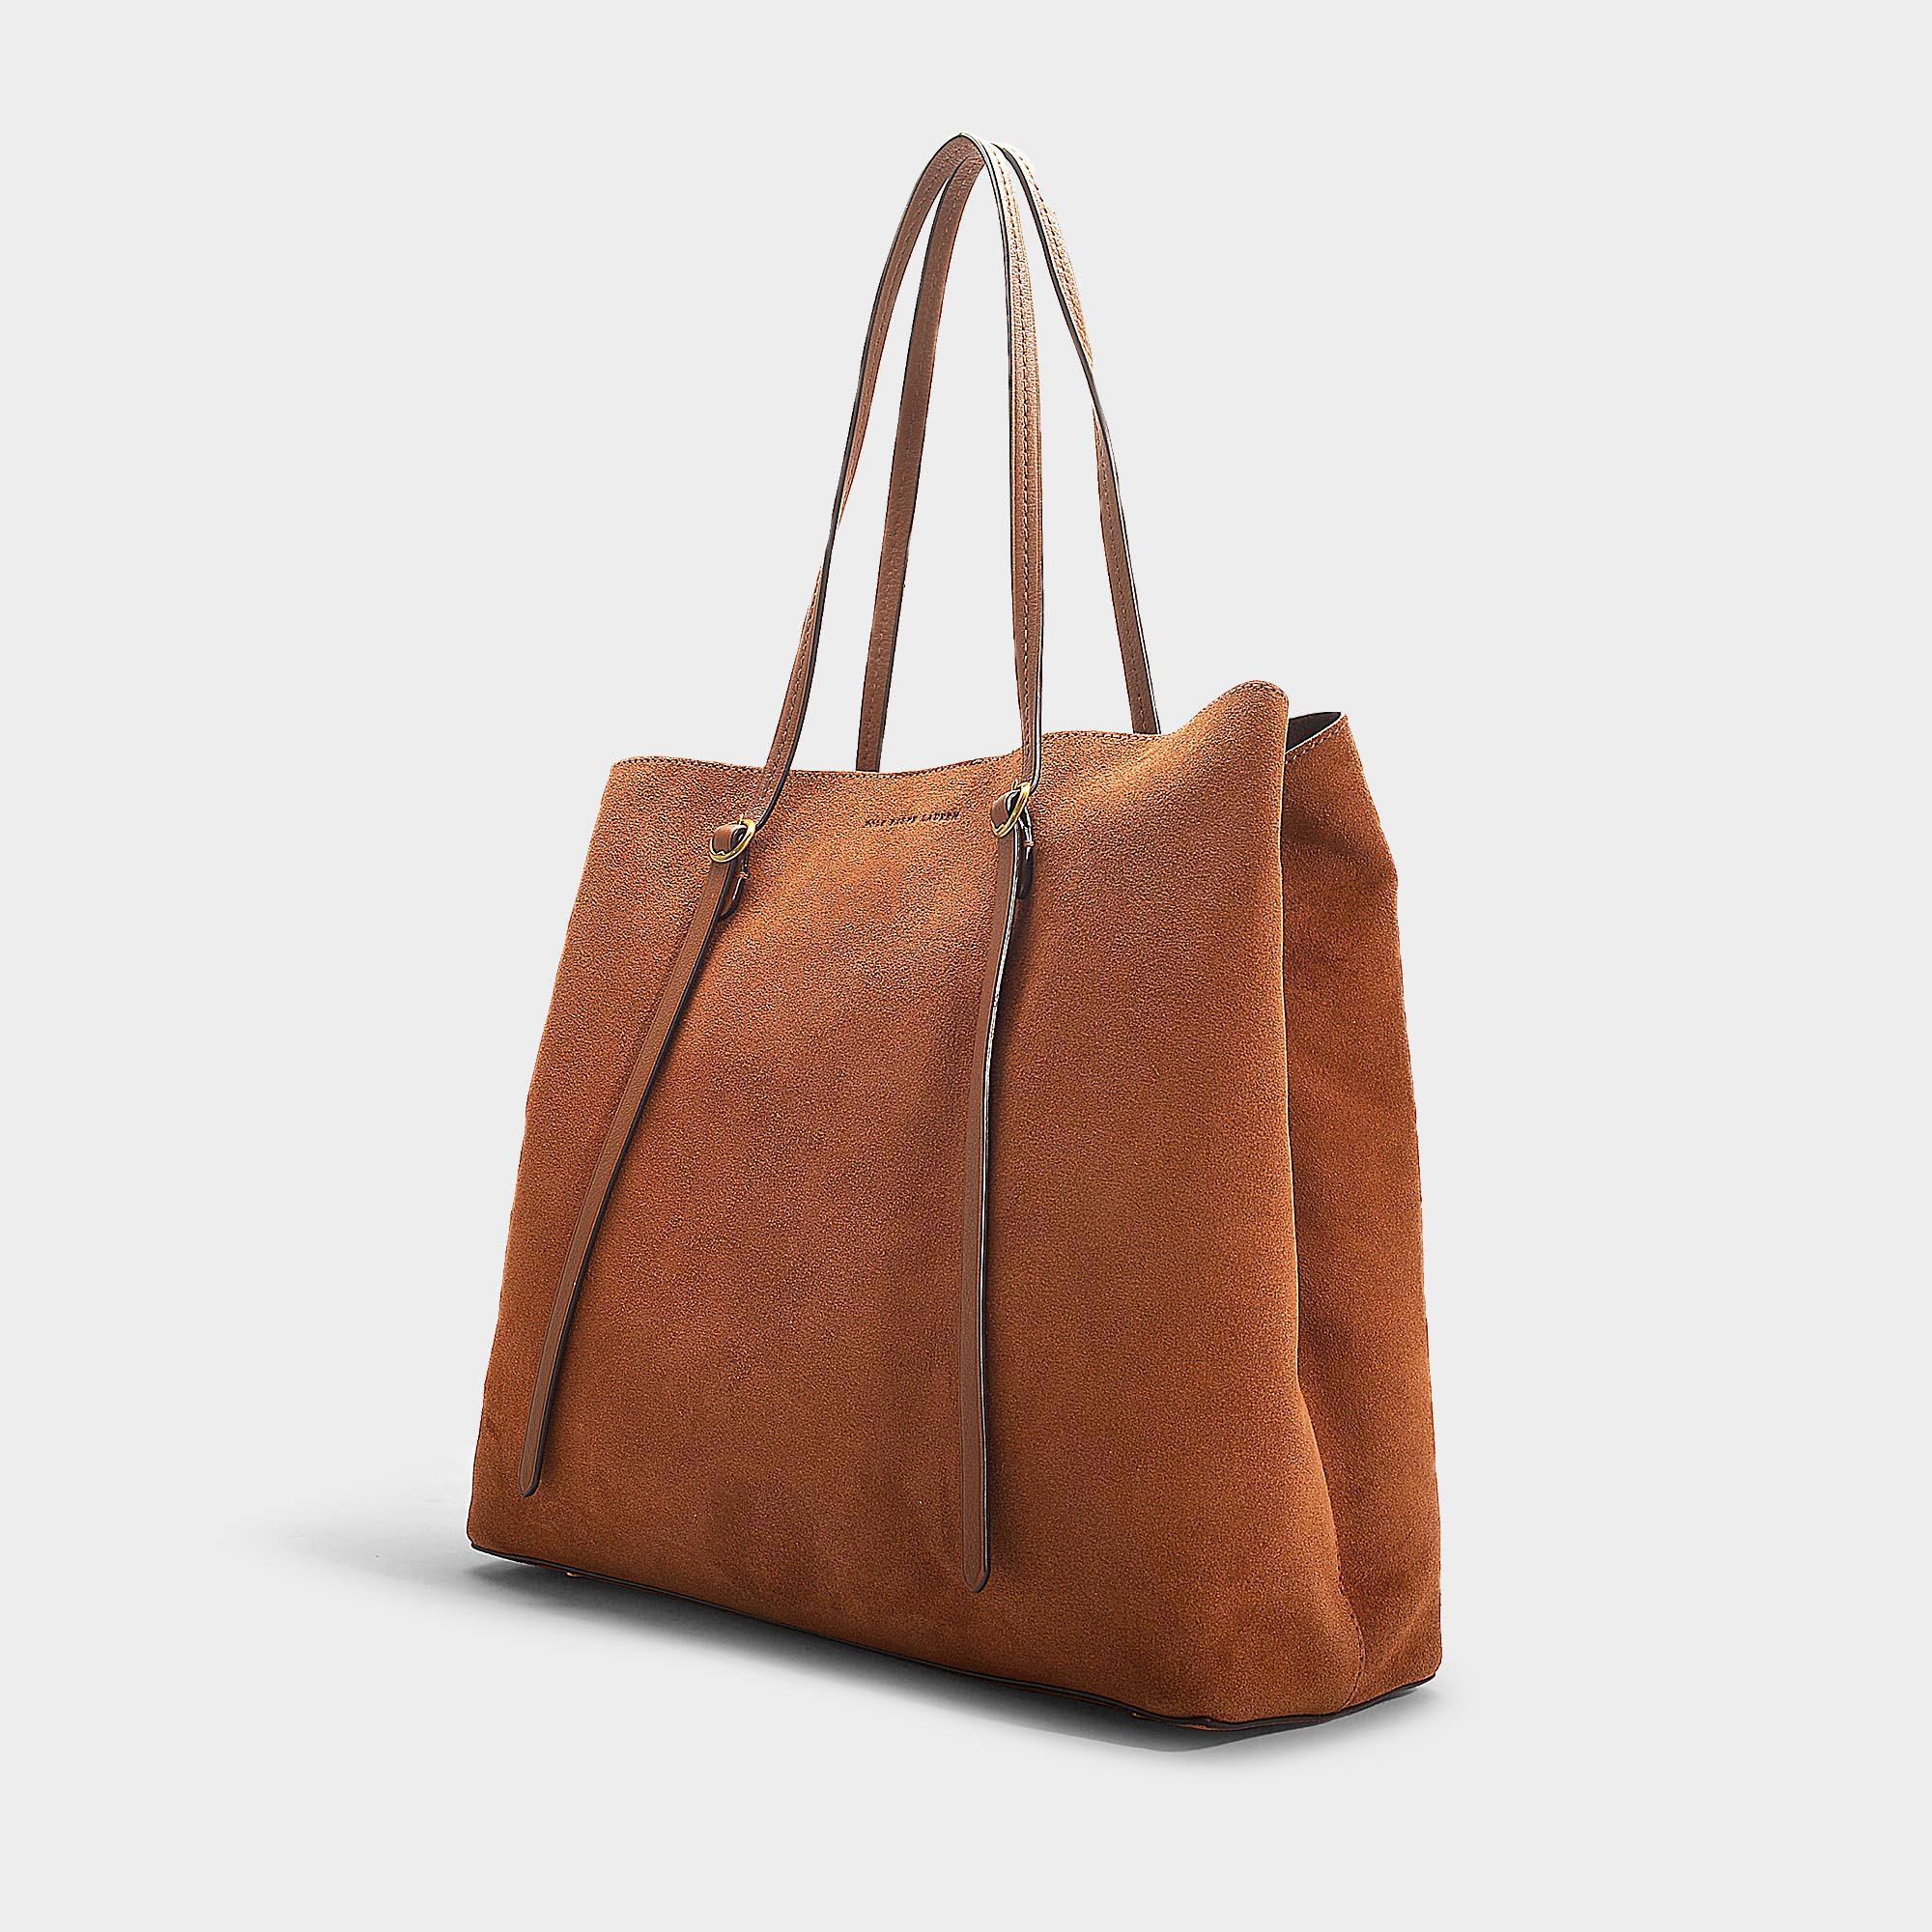 b27213b3c034 Lyst - Polo Ralph Lauren Big Lennox Tote Bag In Camel Calfskin in Brown